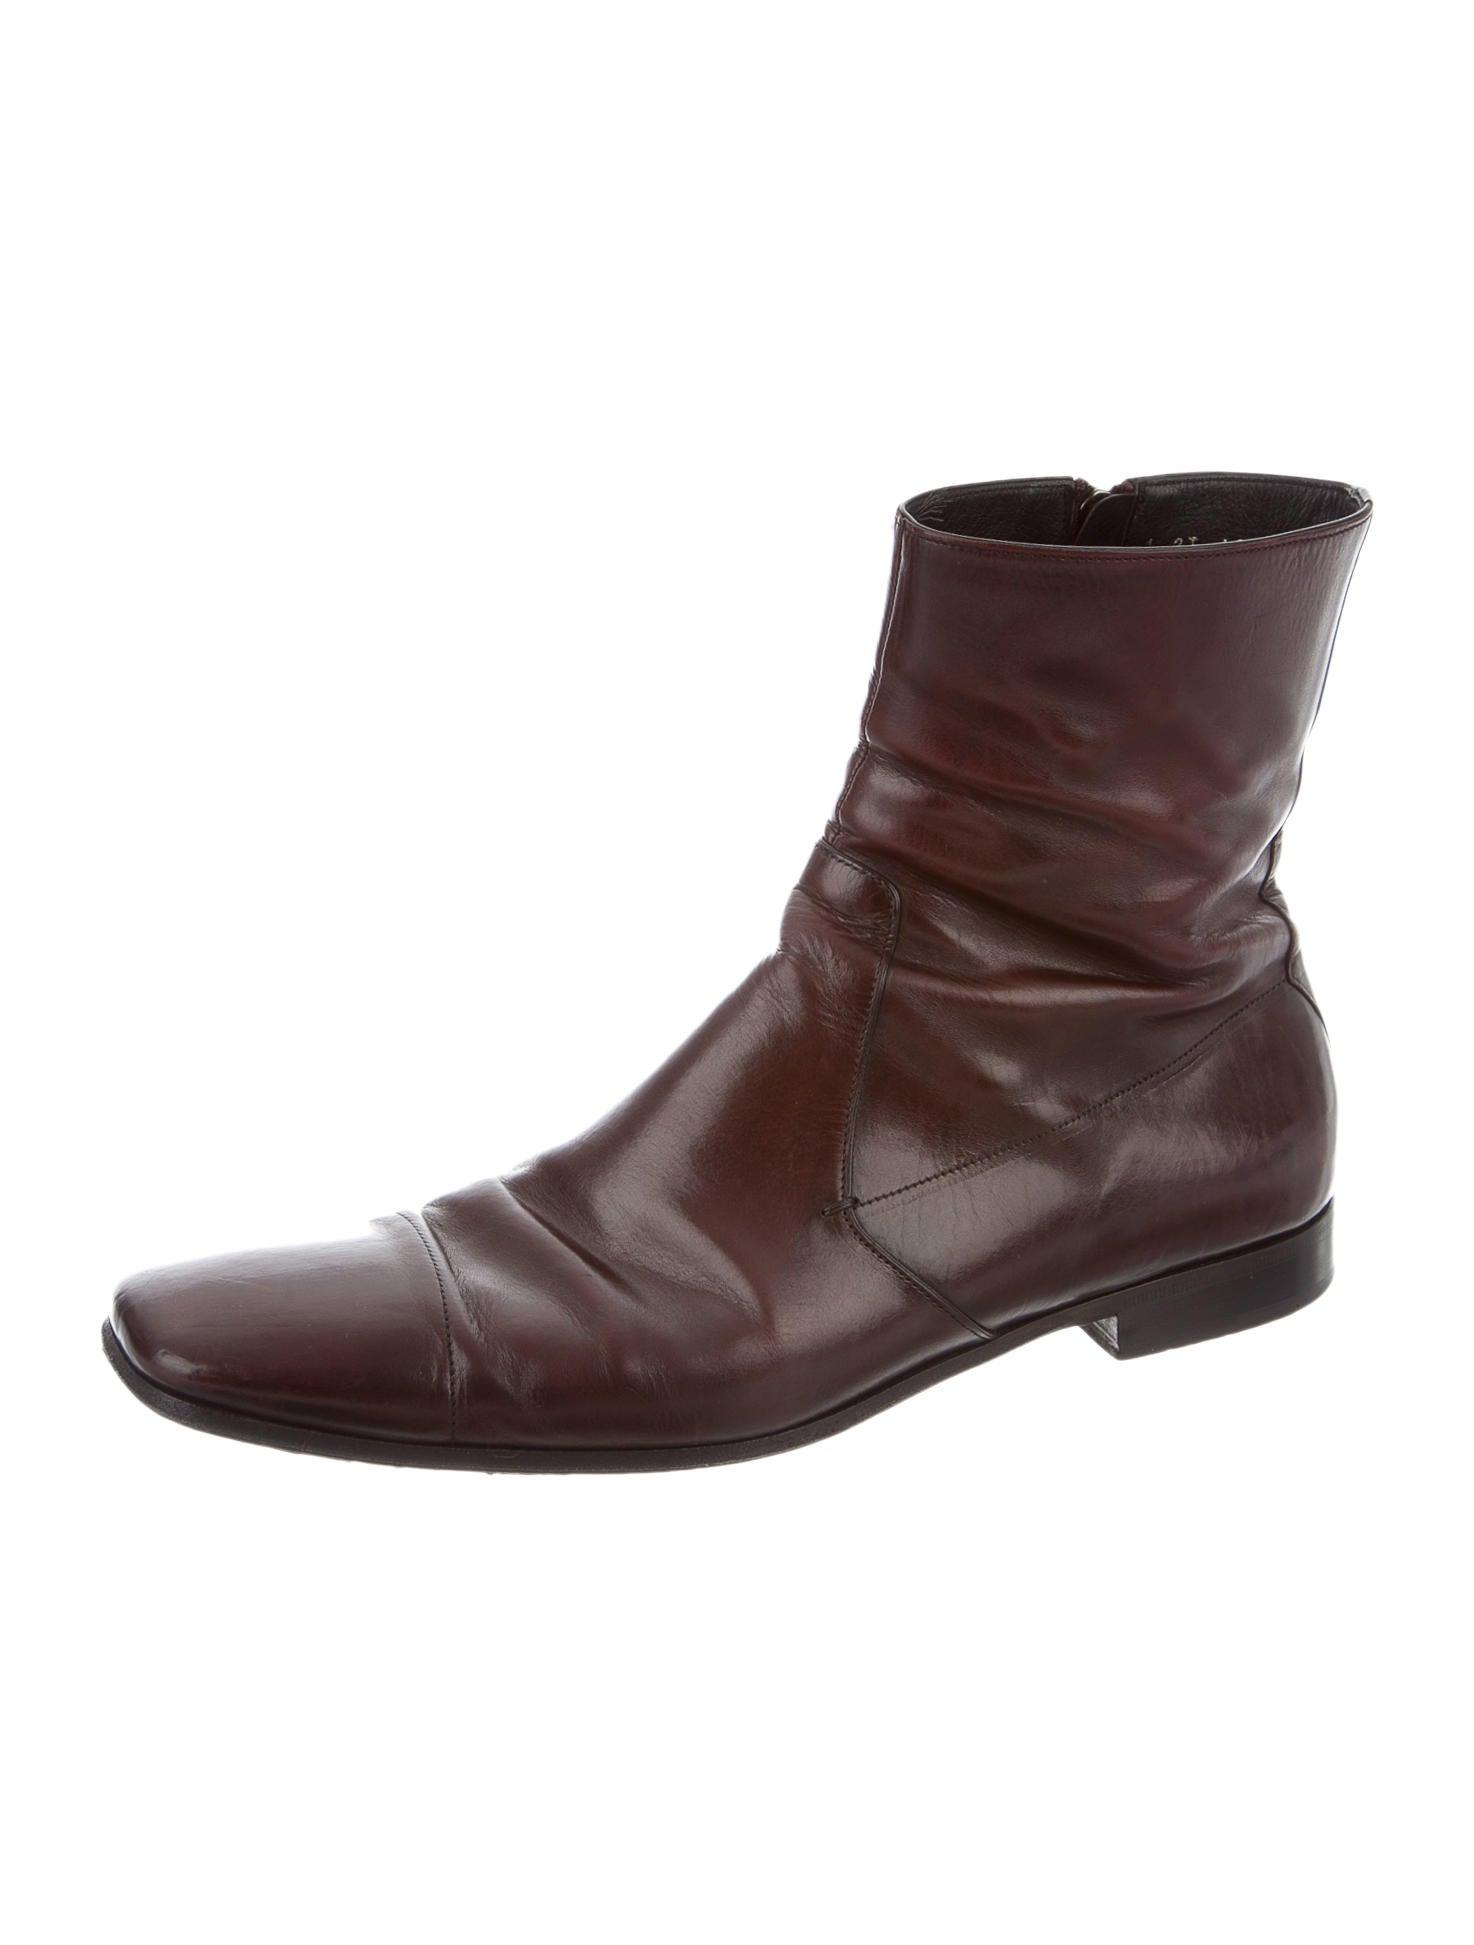 prada leather square toe boots shoes pra86880 the